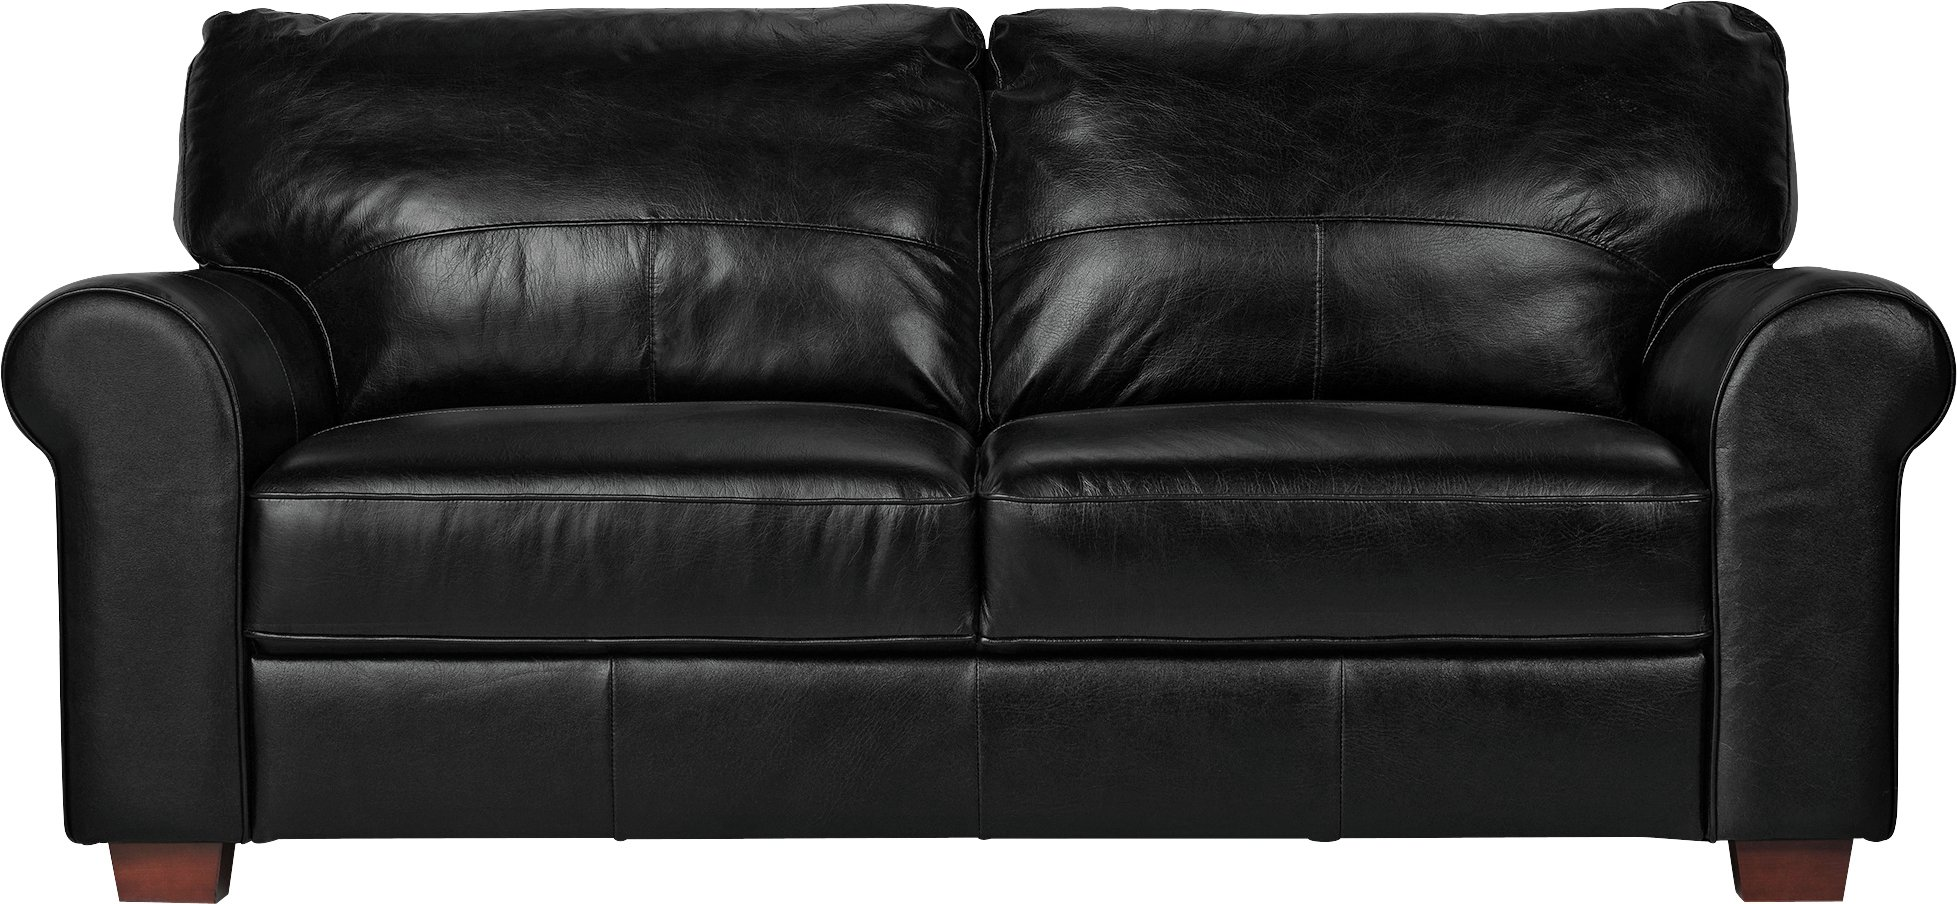 argos home salisbury 3 seater leather sofa black. Black Bedroom Furniture Sets. Home Design Ideas